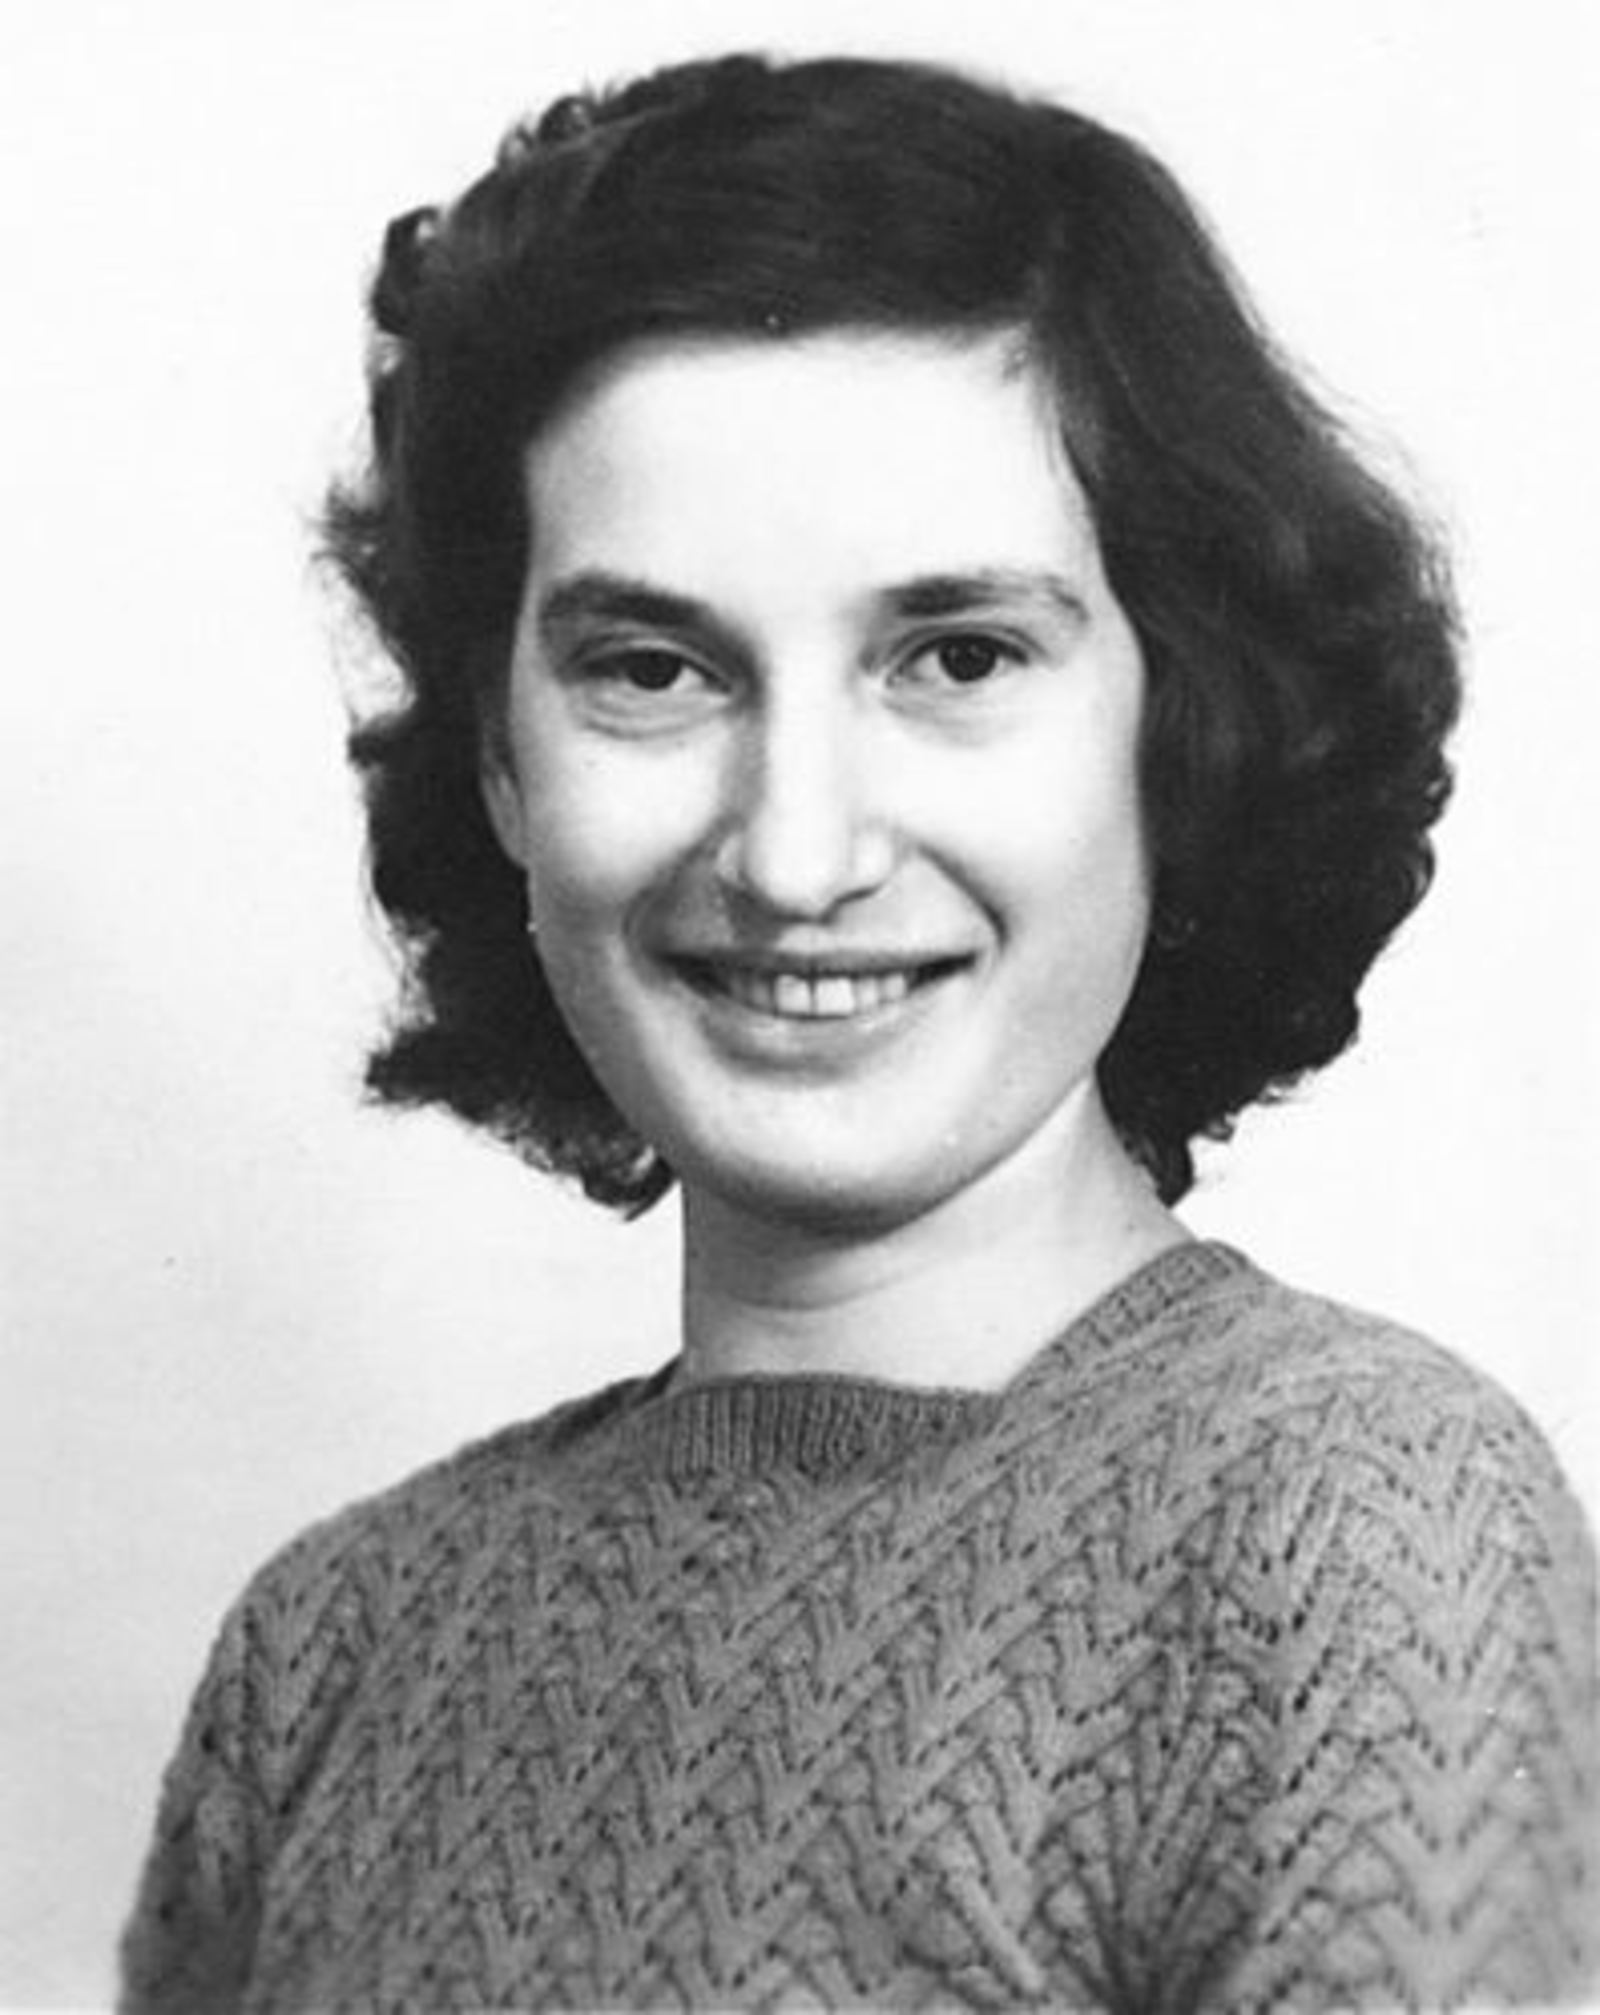 Dam Johanna M 1935 1953 Portret